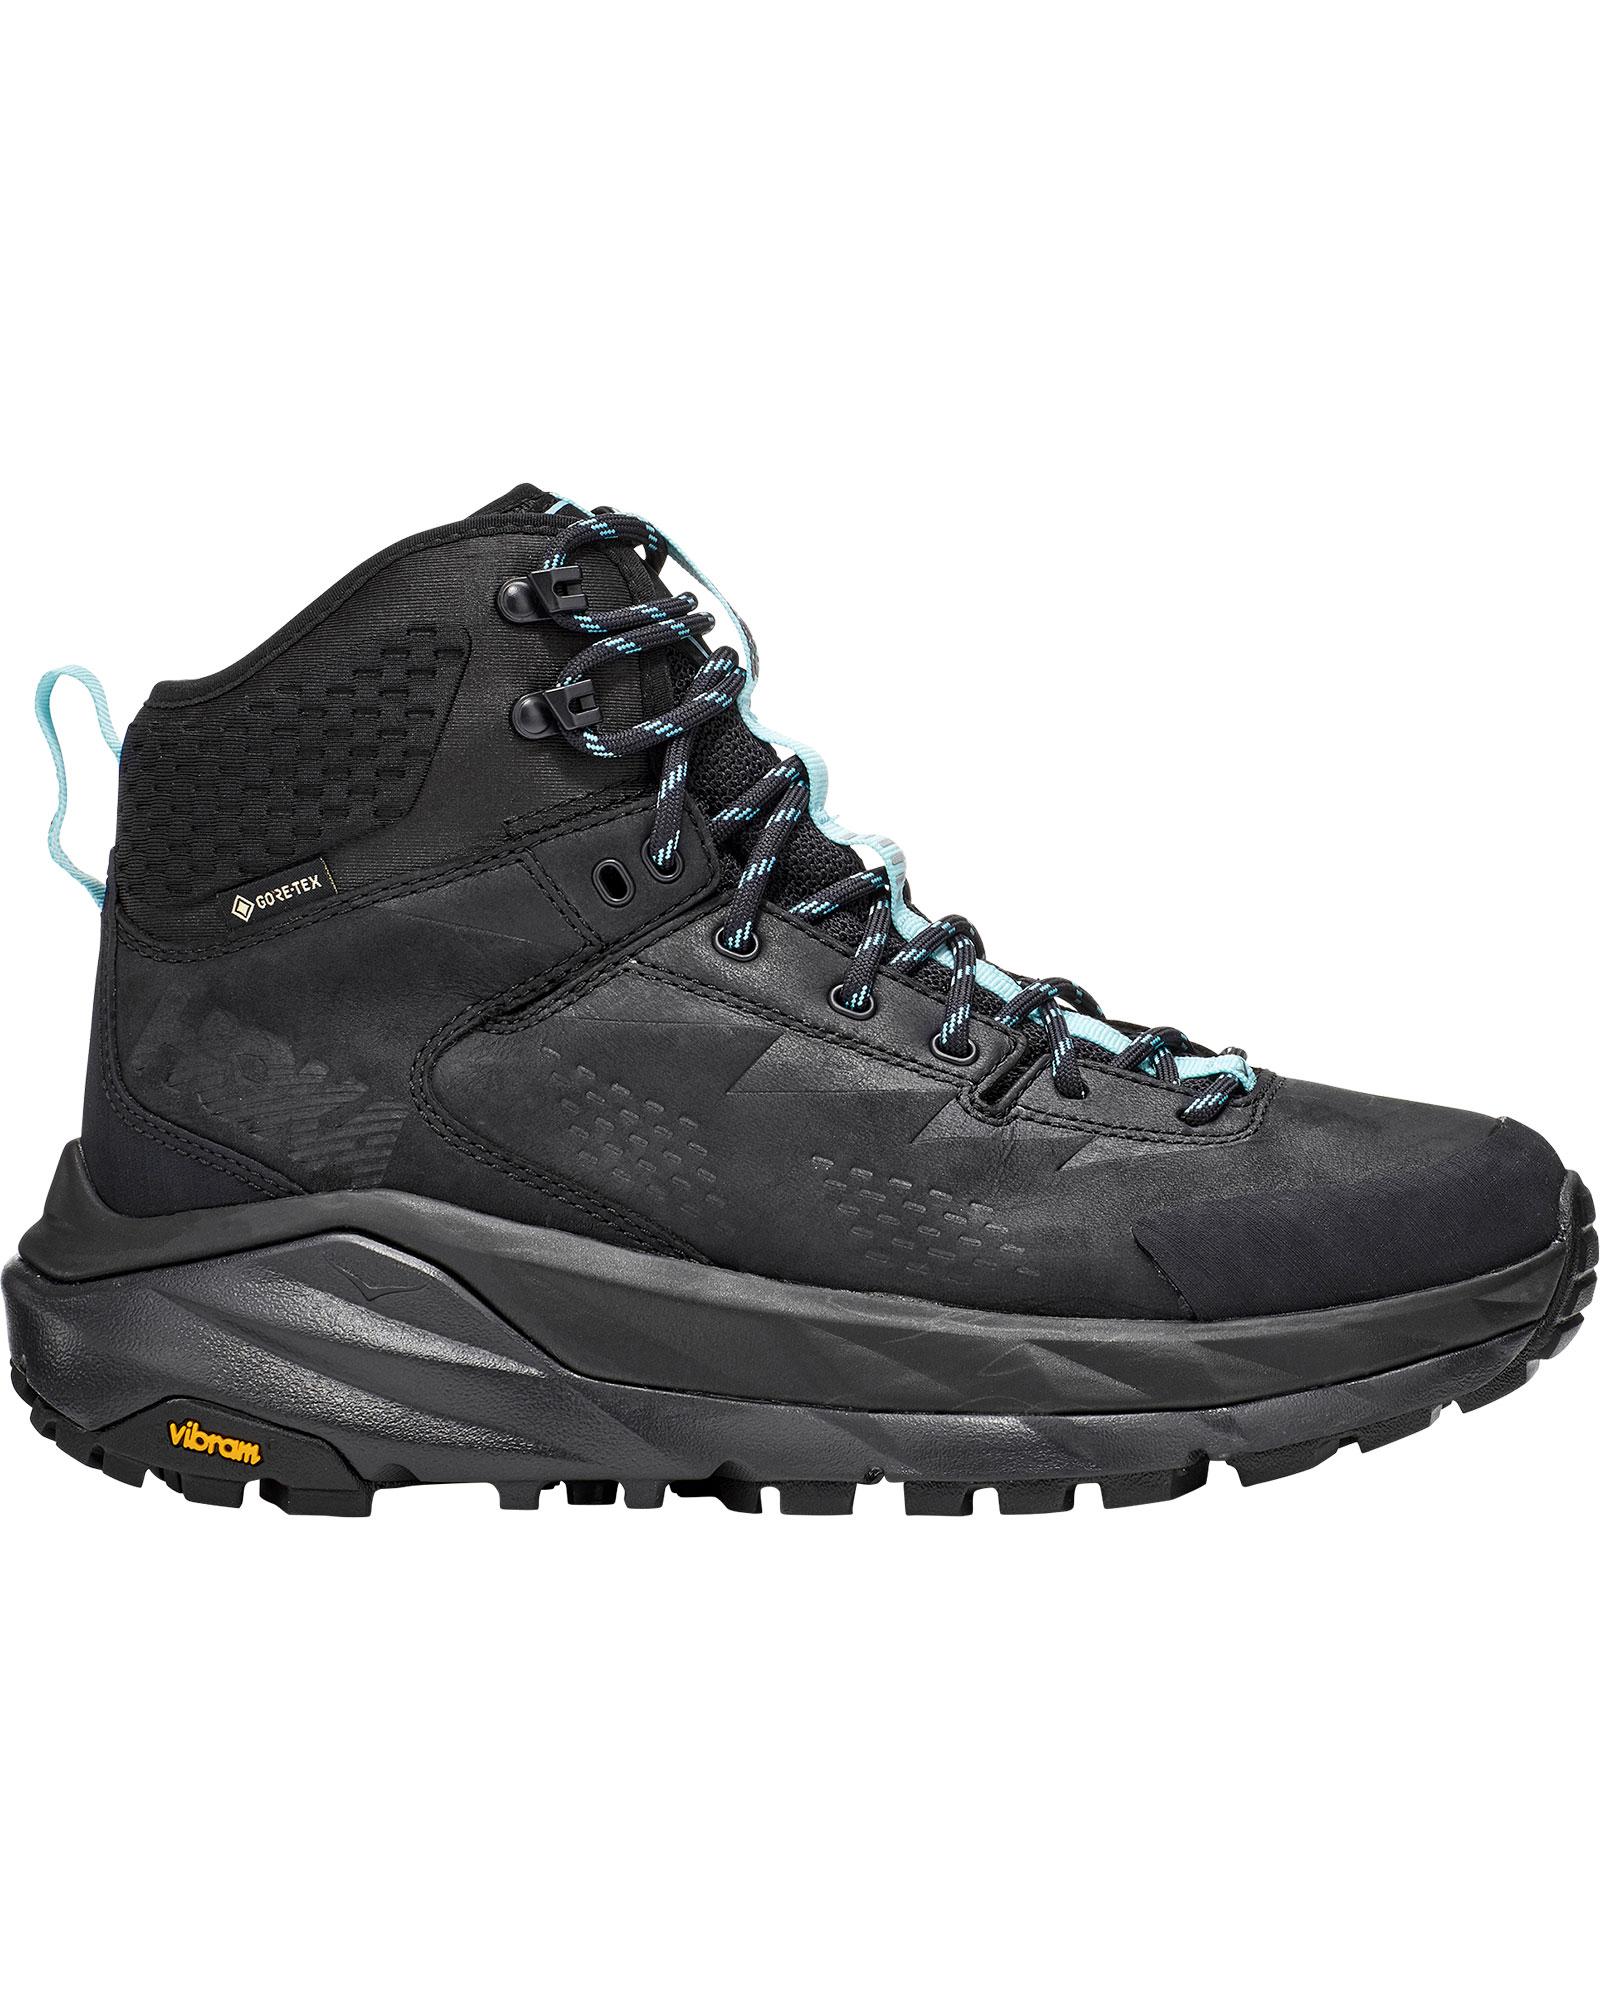 Hoka One One Women's Kaha GORE-TEX Walking Boots 0